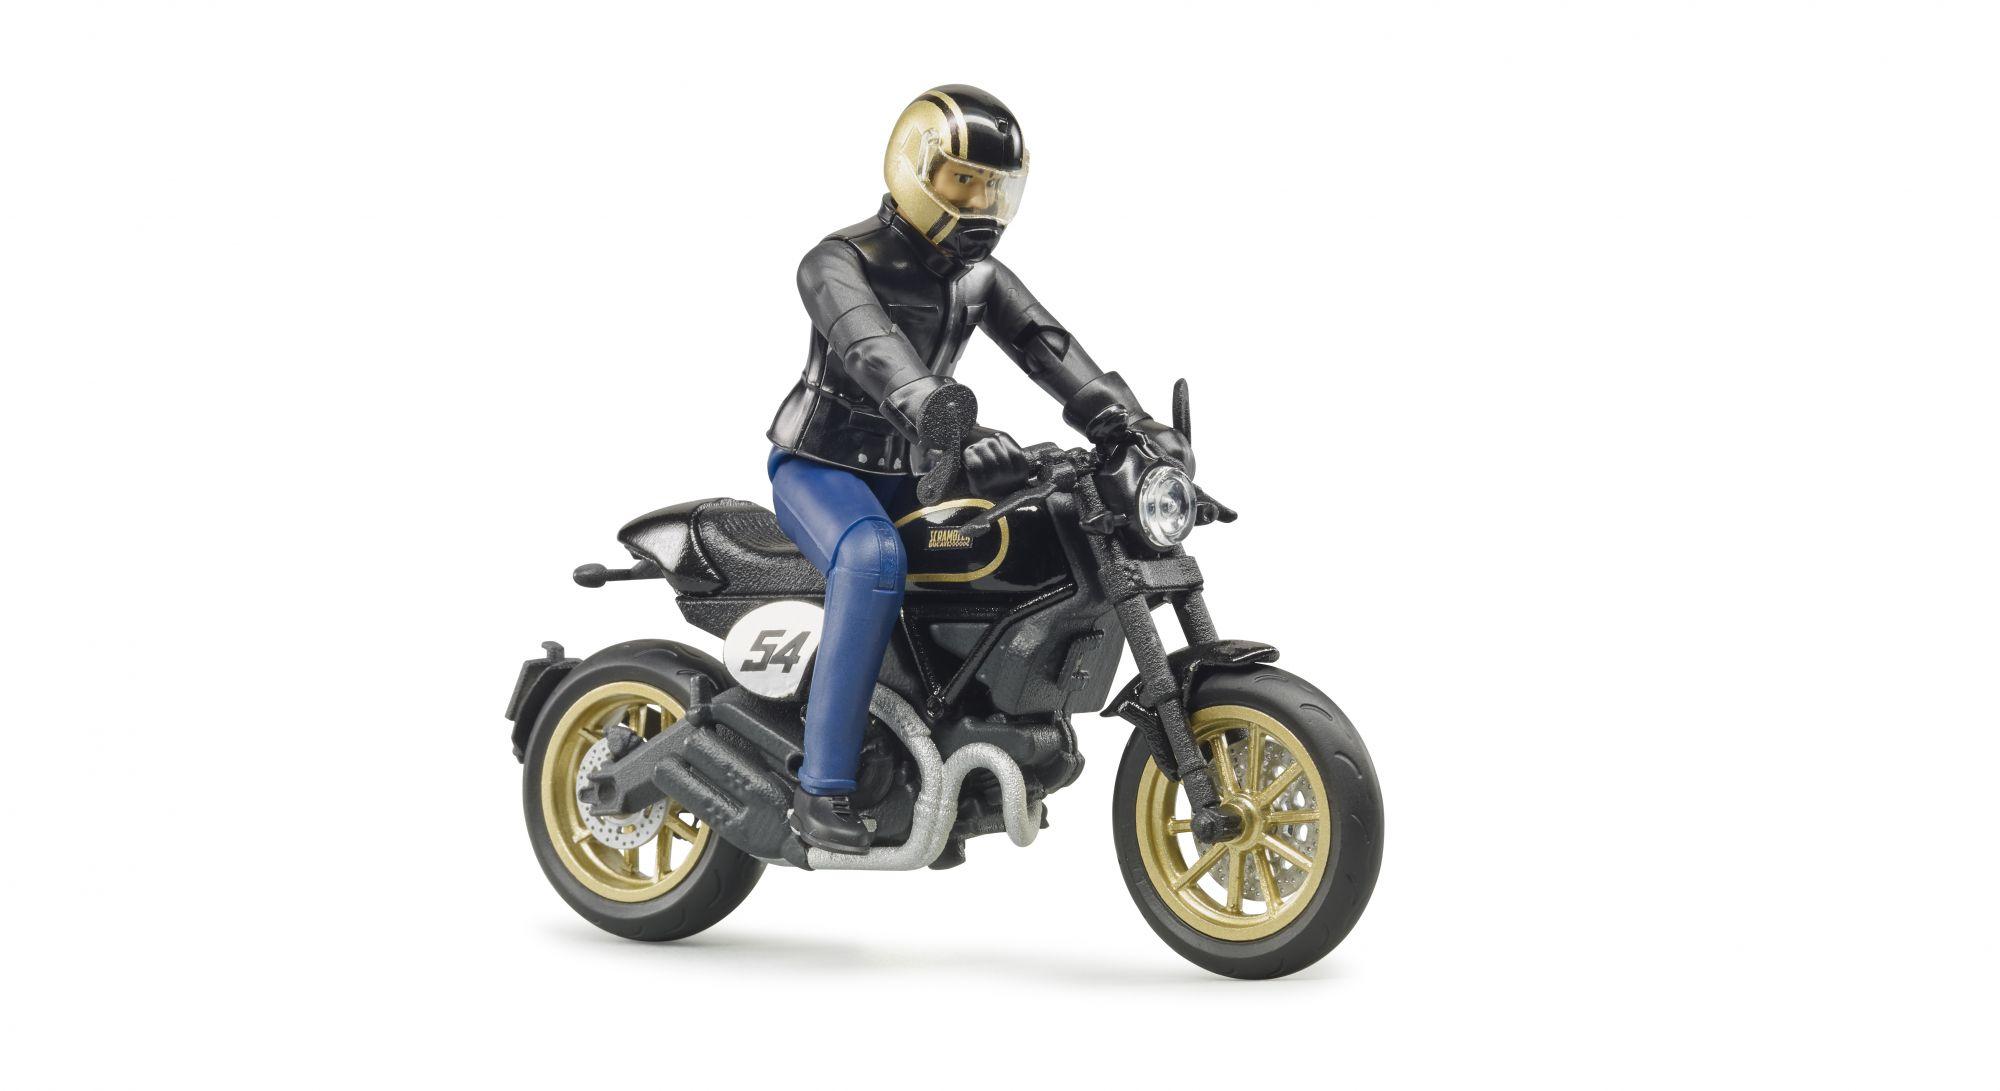 Bruder 63050 - Ducati Scrambler Cafe Racer motor